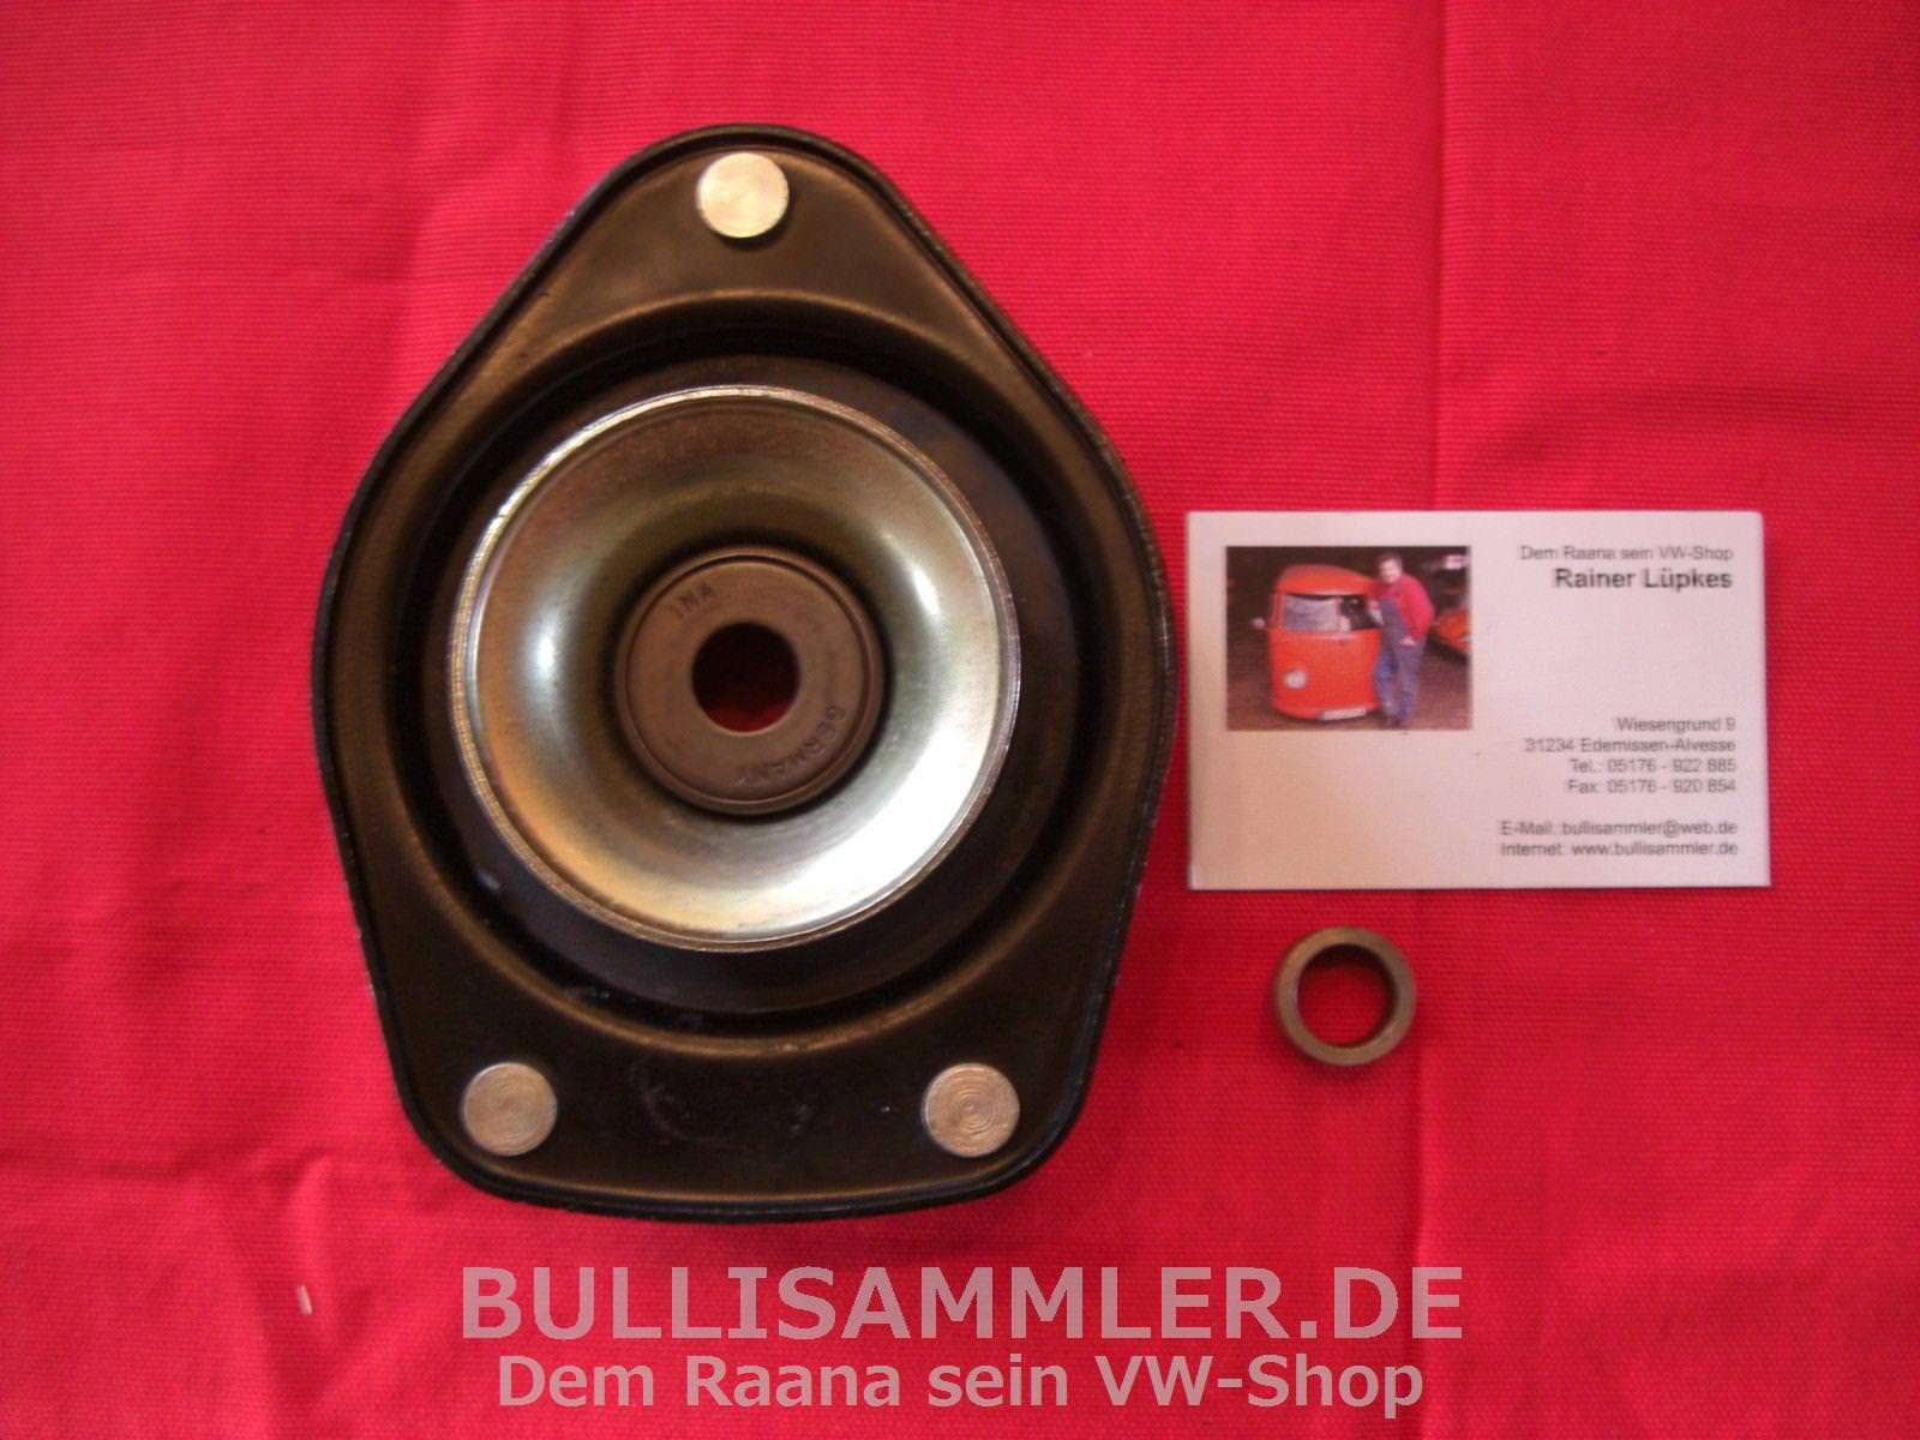 Dem_Raana_Sein_vw-shop; Raana; Bullisammler; Shop; VW